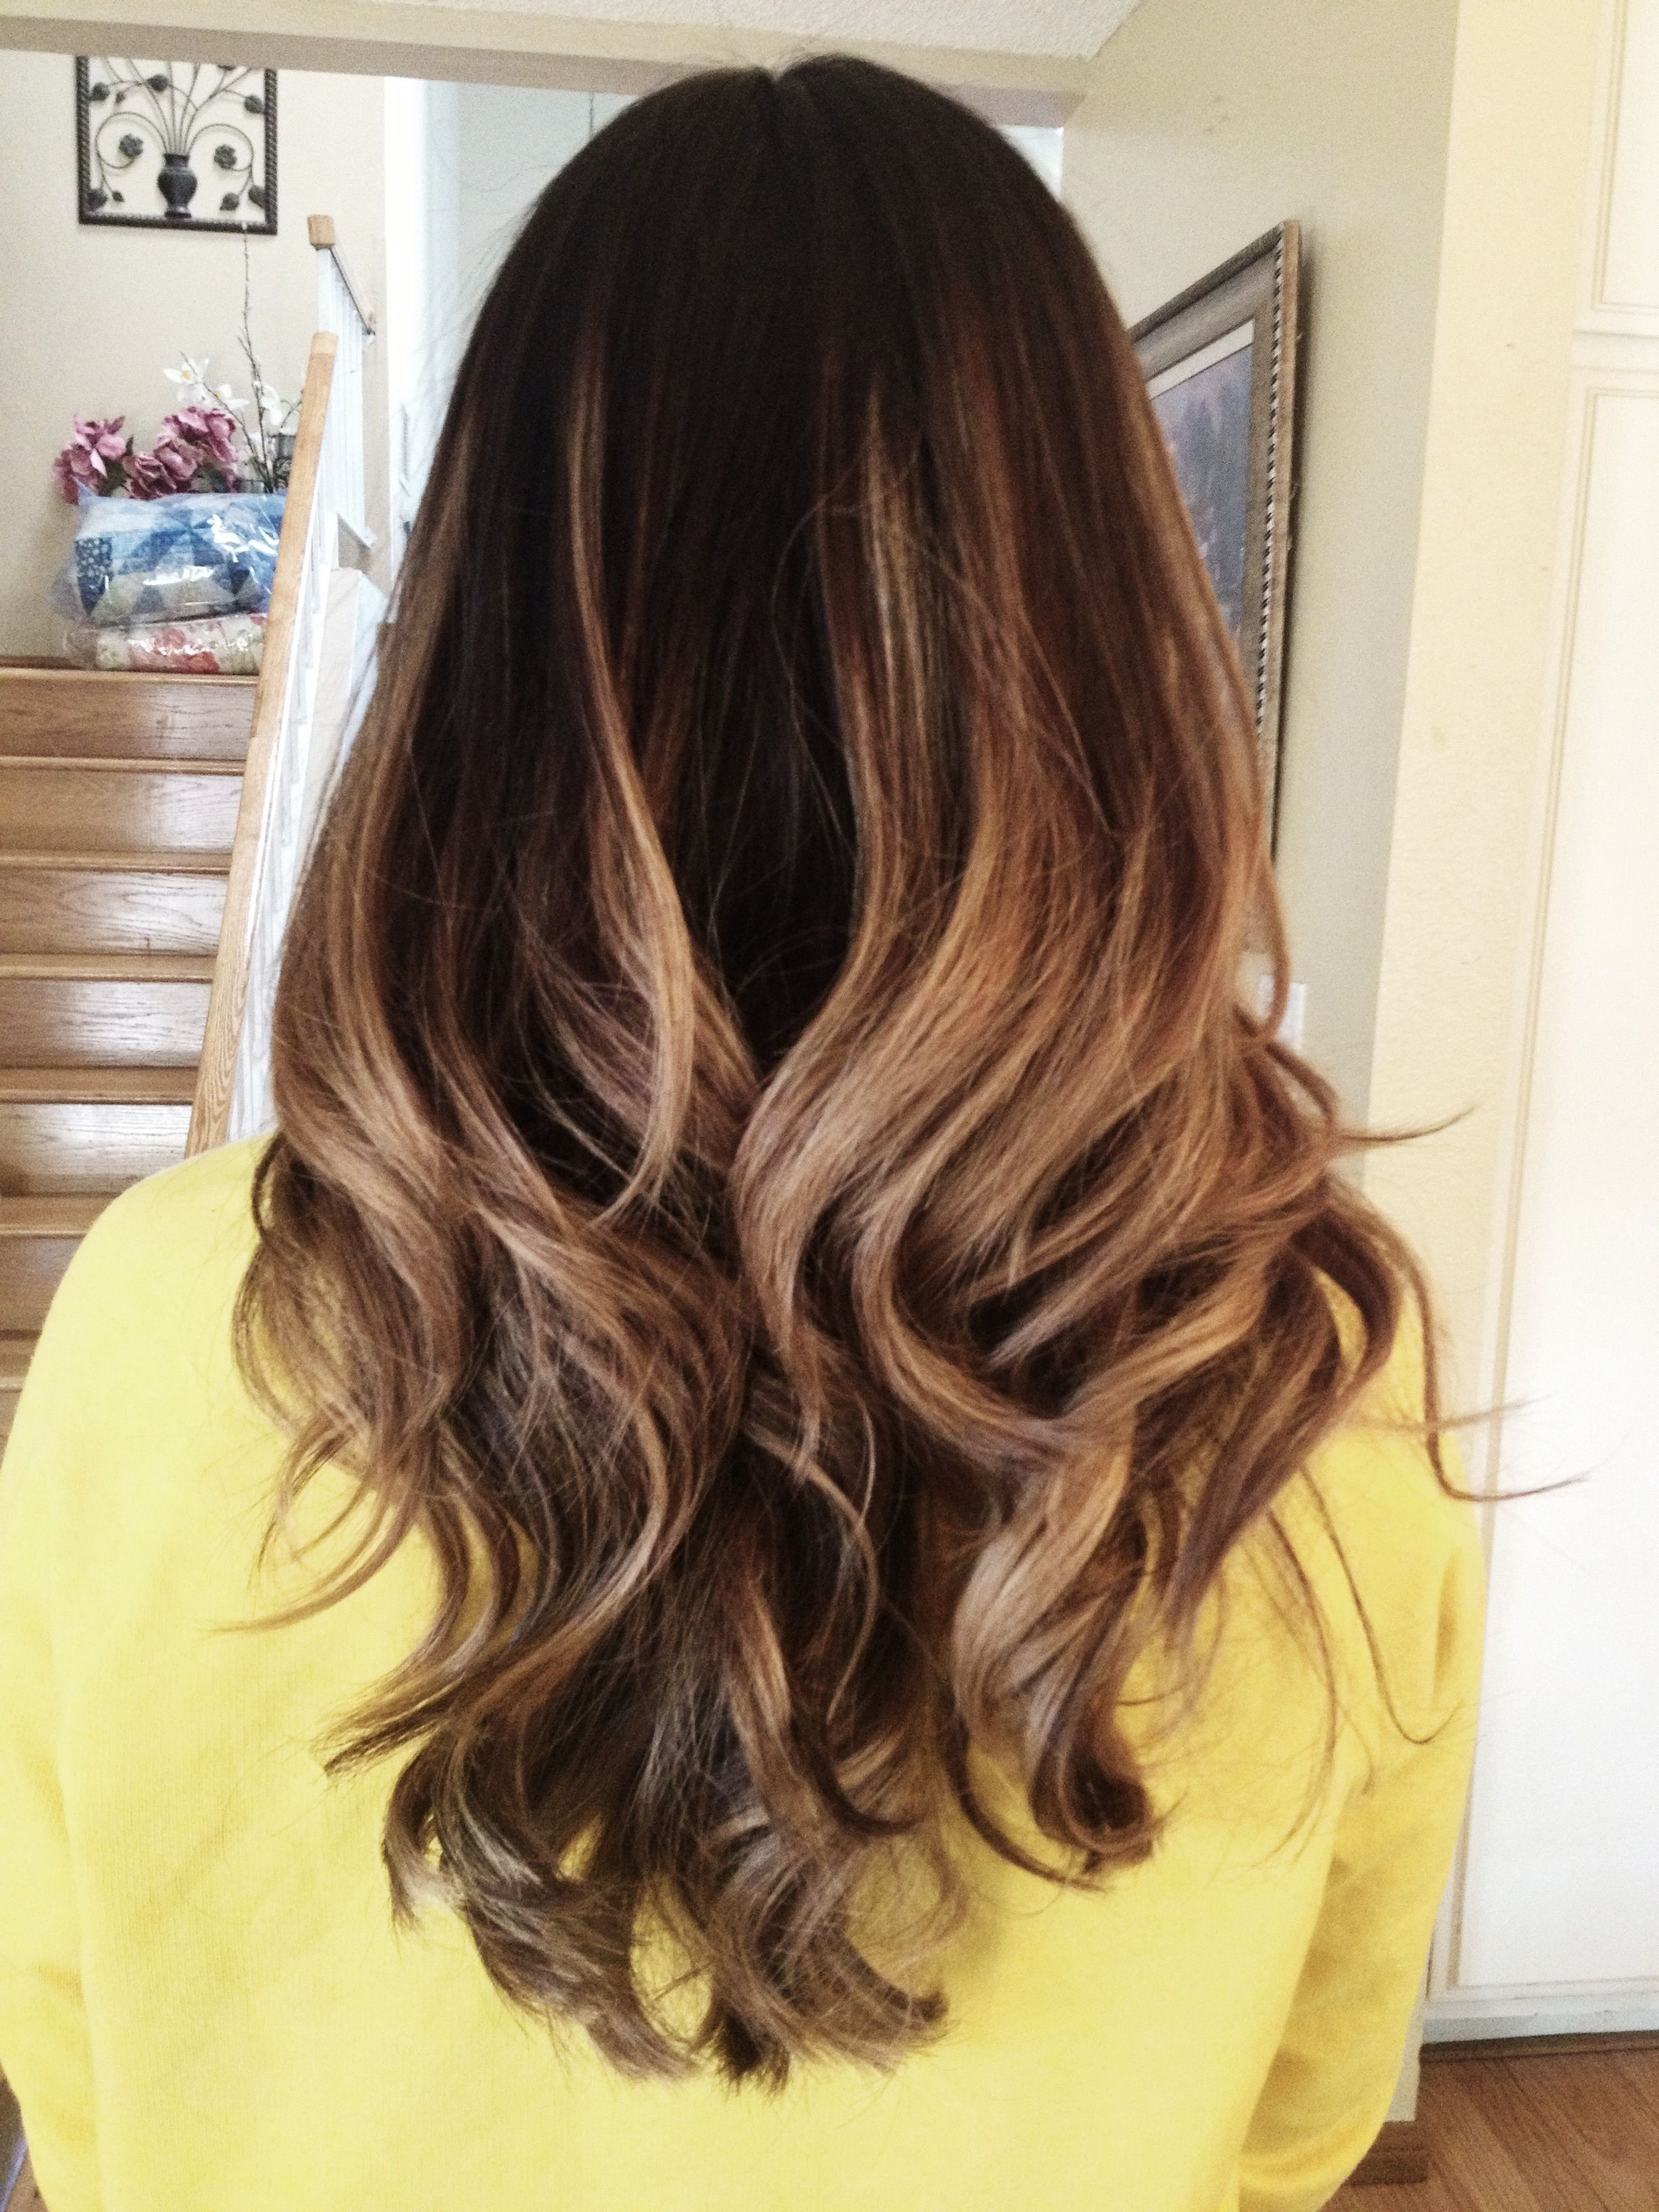 How To Tile A Diy Backsplash Haircolour Pinterest Hair Ombre